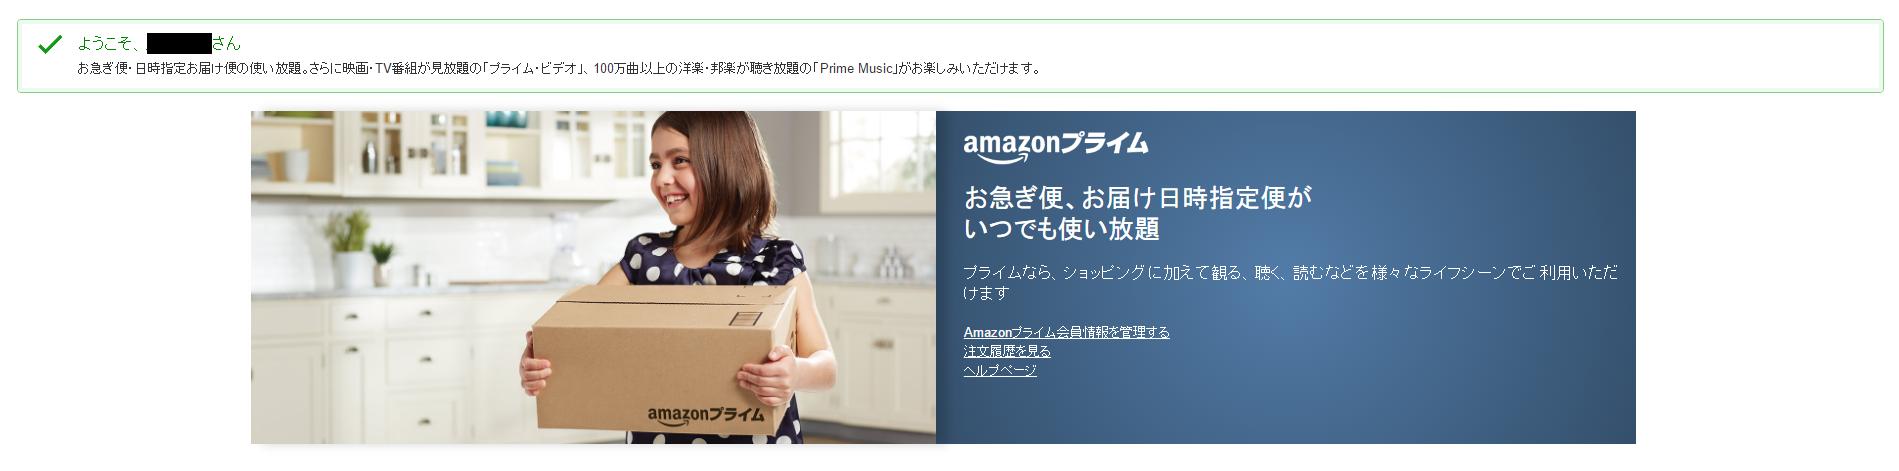 amazon動画配信